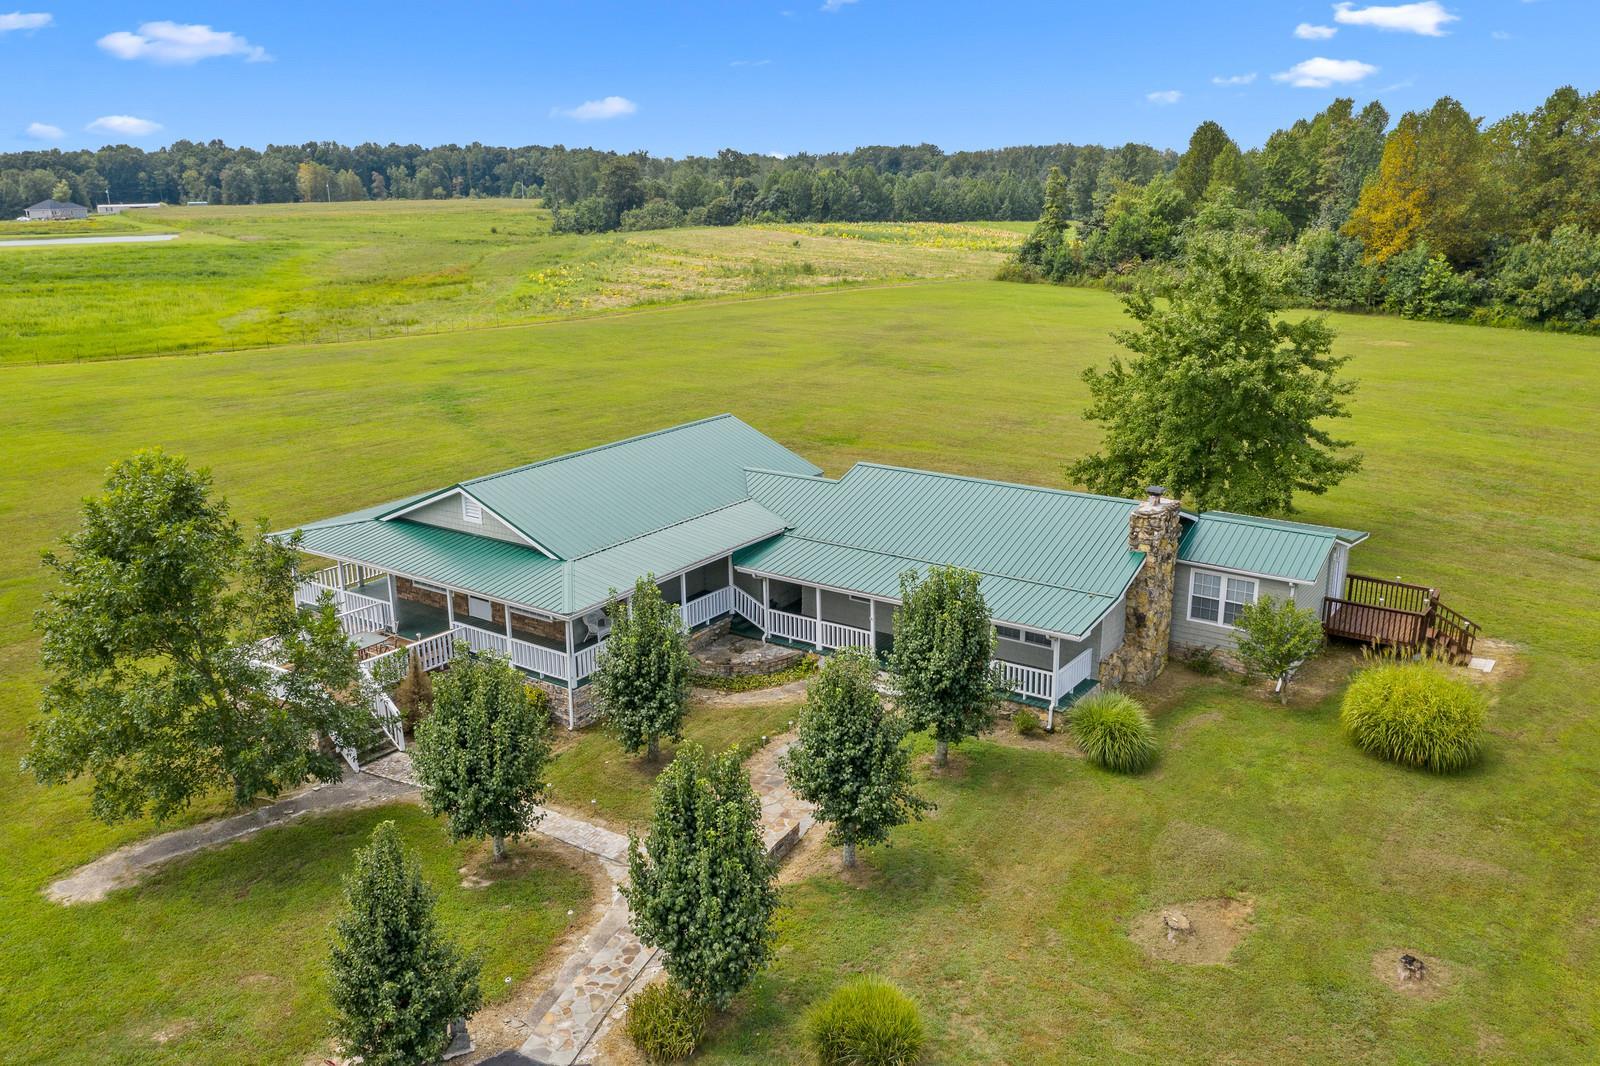 1253 Jimtown Rd, Lafayette, TN 37083 - Lafayette, TN real estate listing